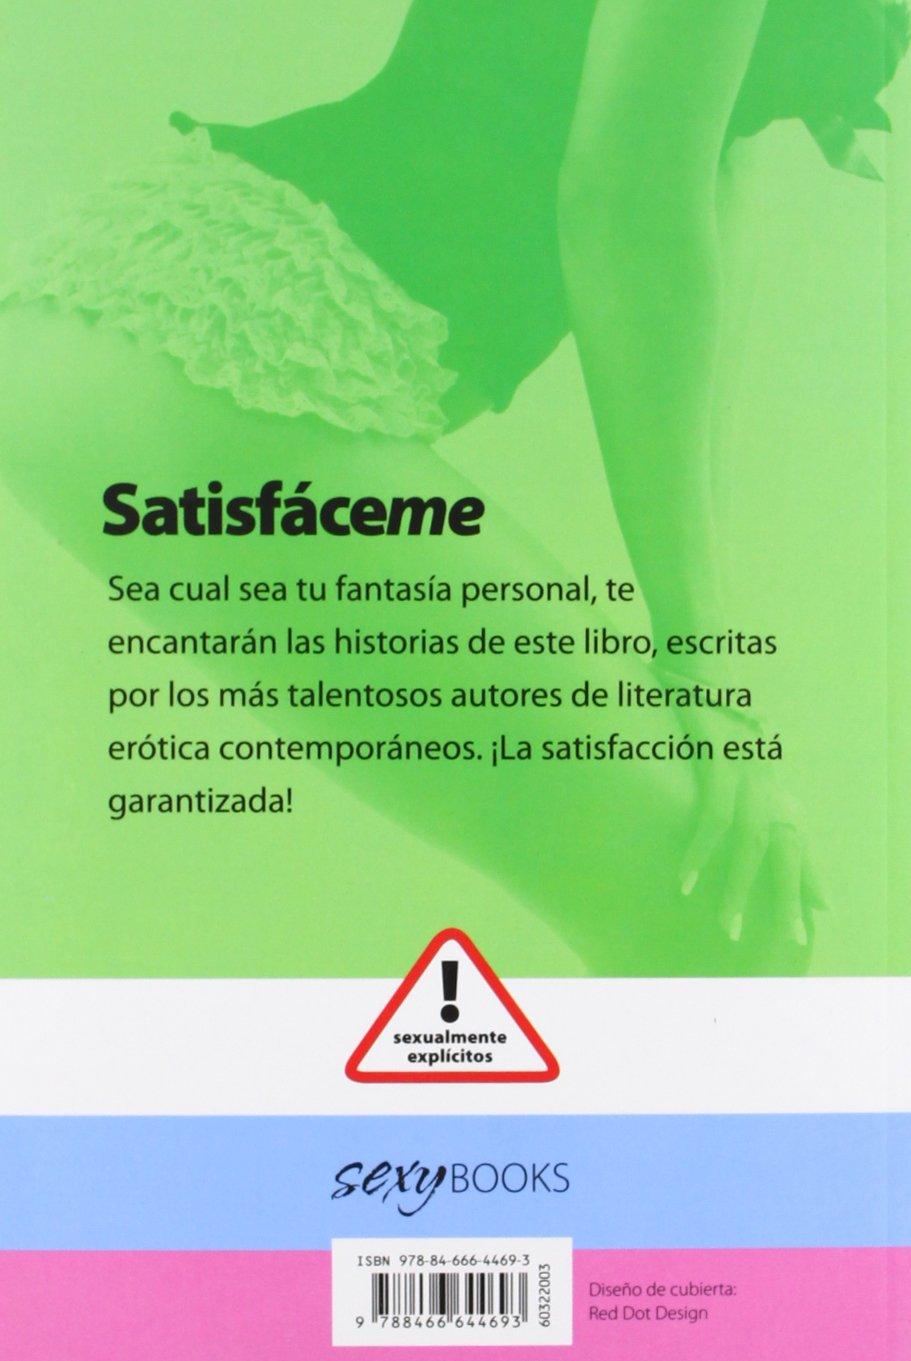 Amazon.com: Satisfaceme (Antologia de Miranda Forbes) (Spanish Edition) (9788466644693): Miranda Forbes: Books